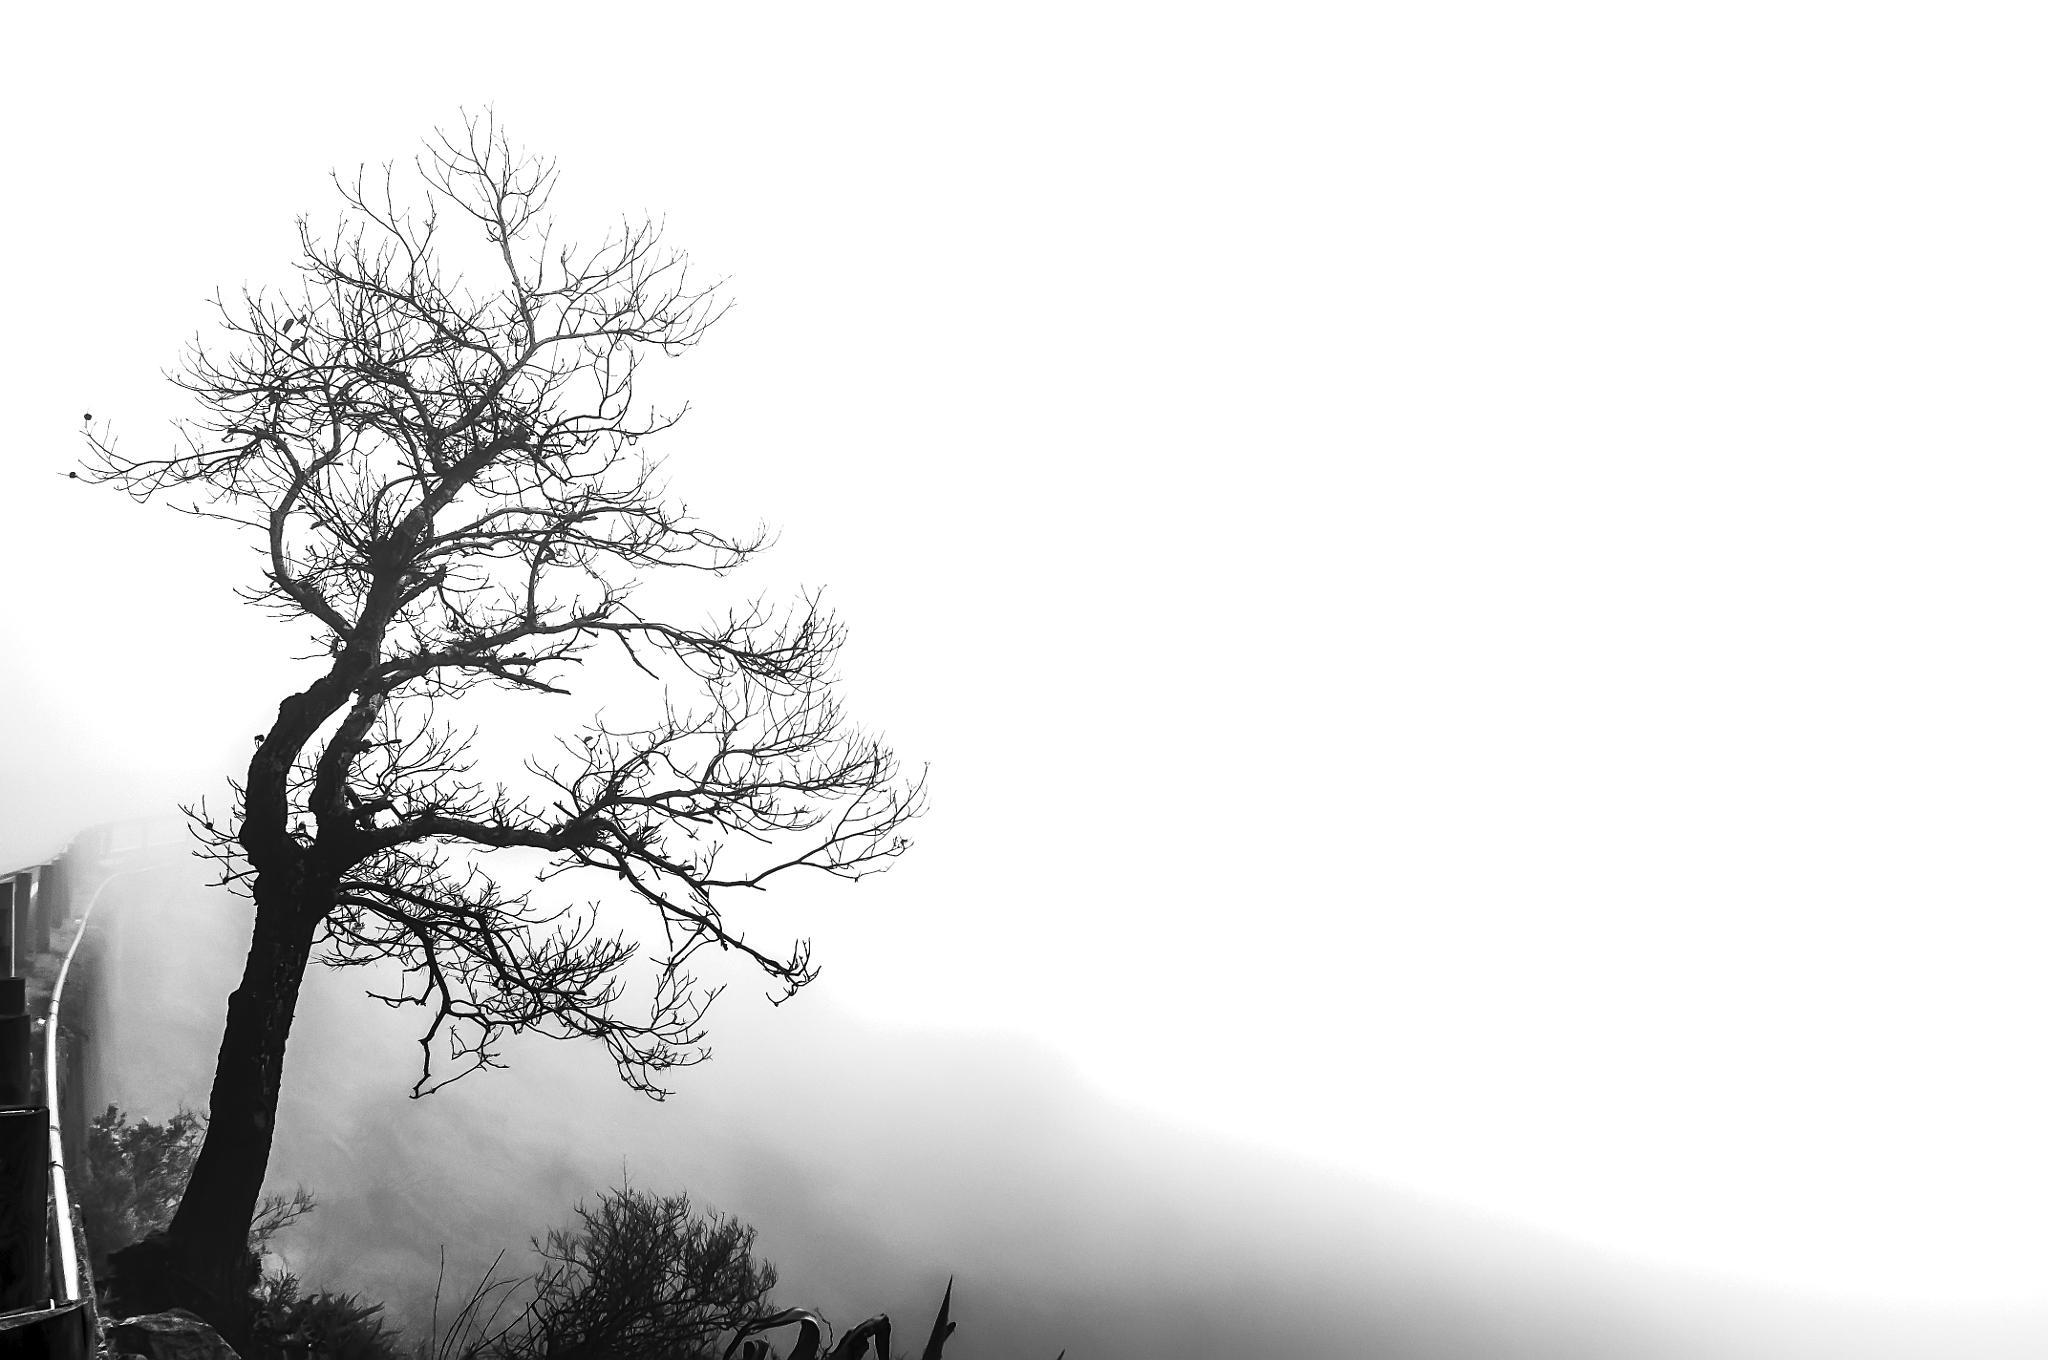 TREE by Parsifal Garcia